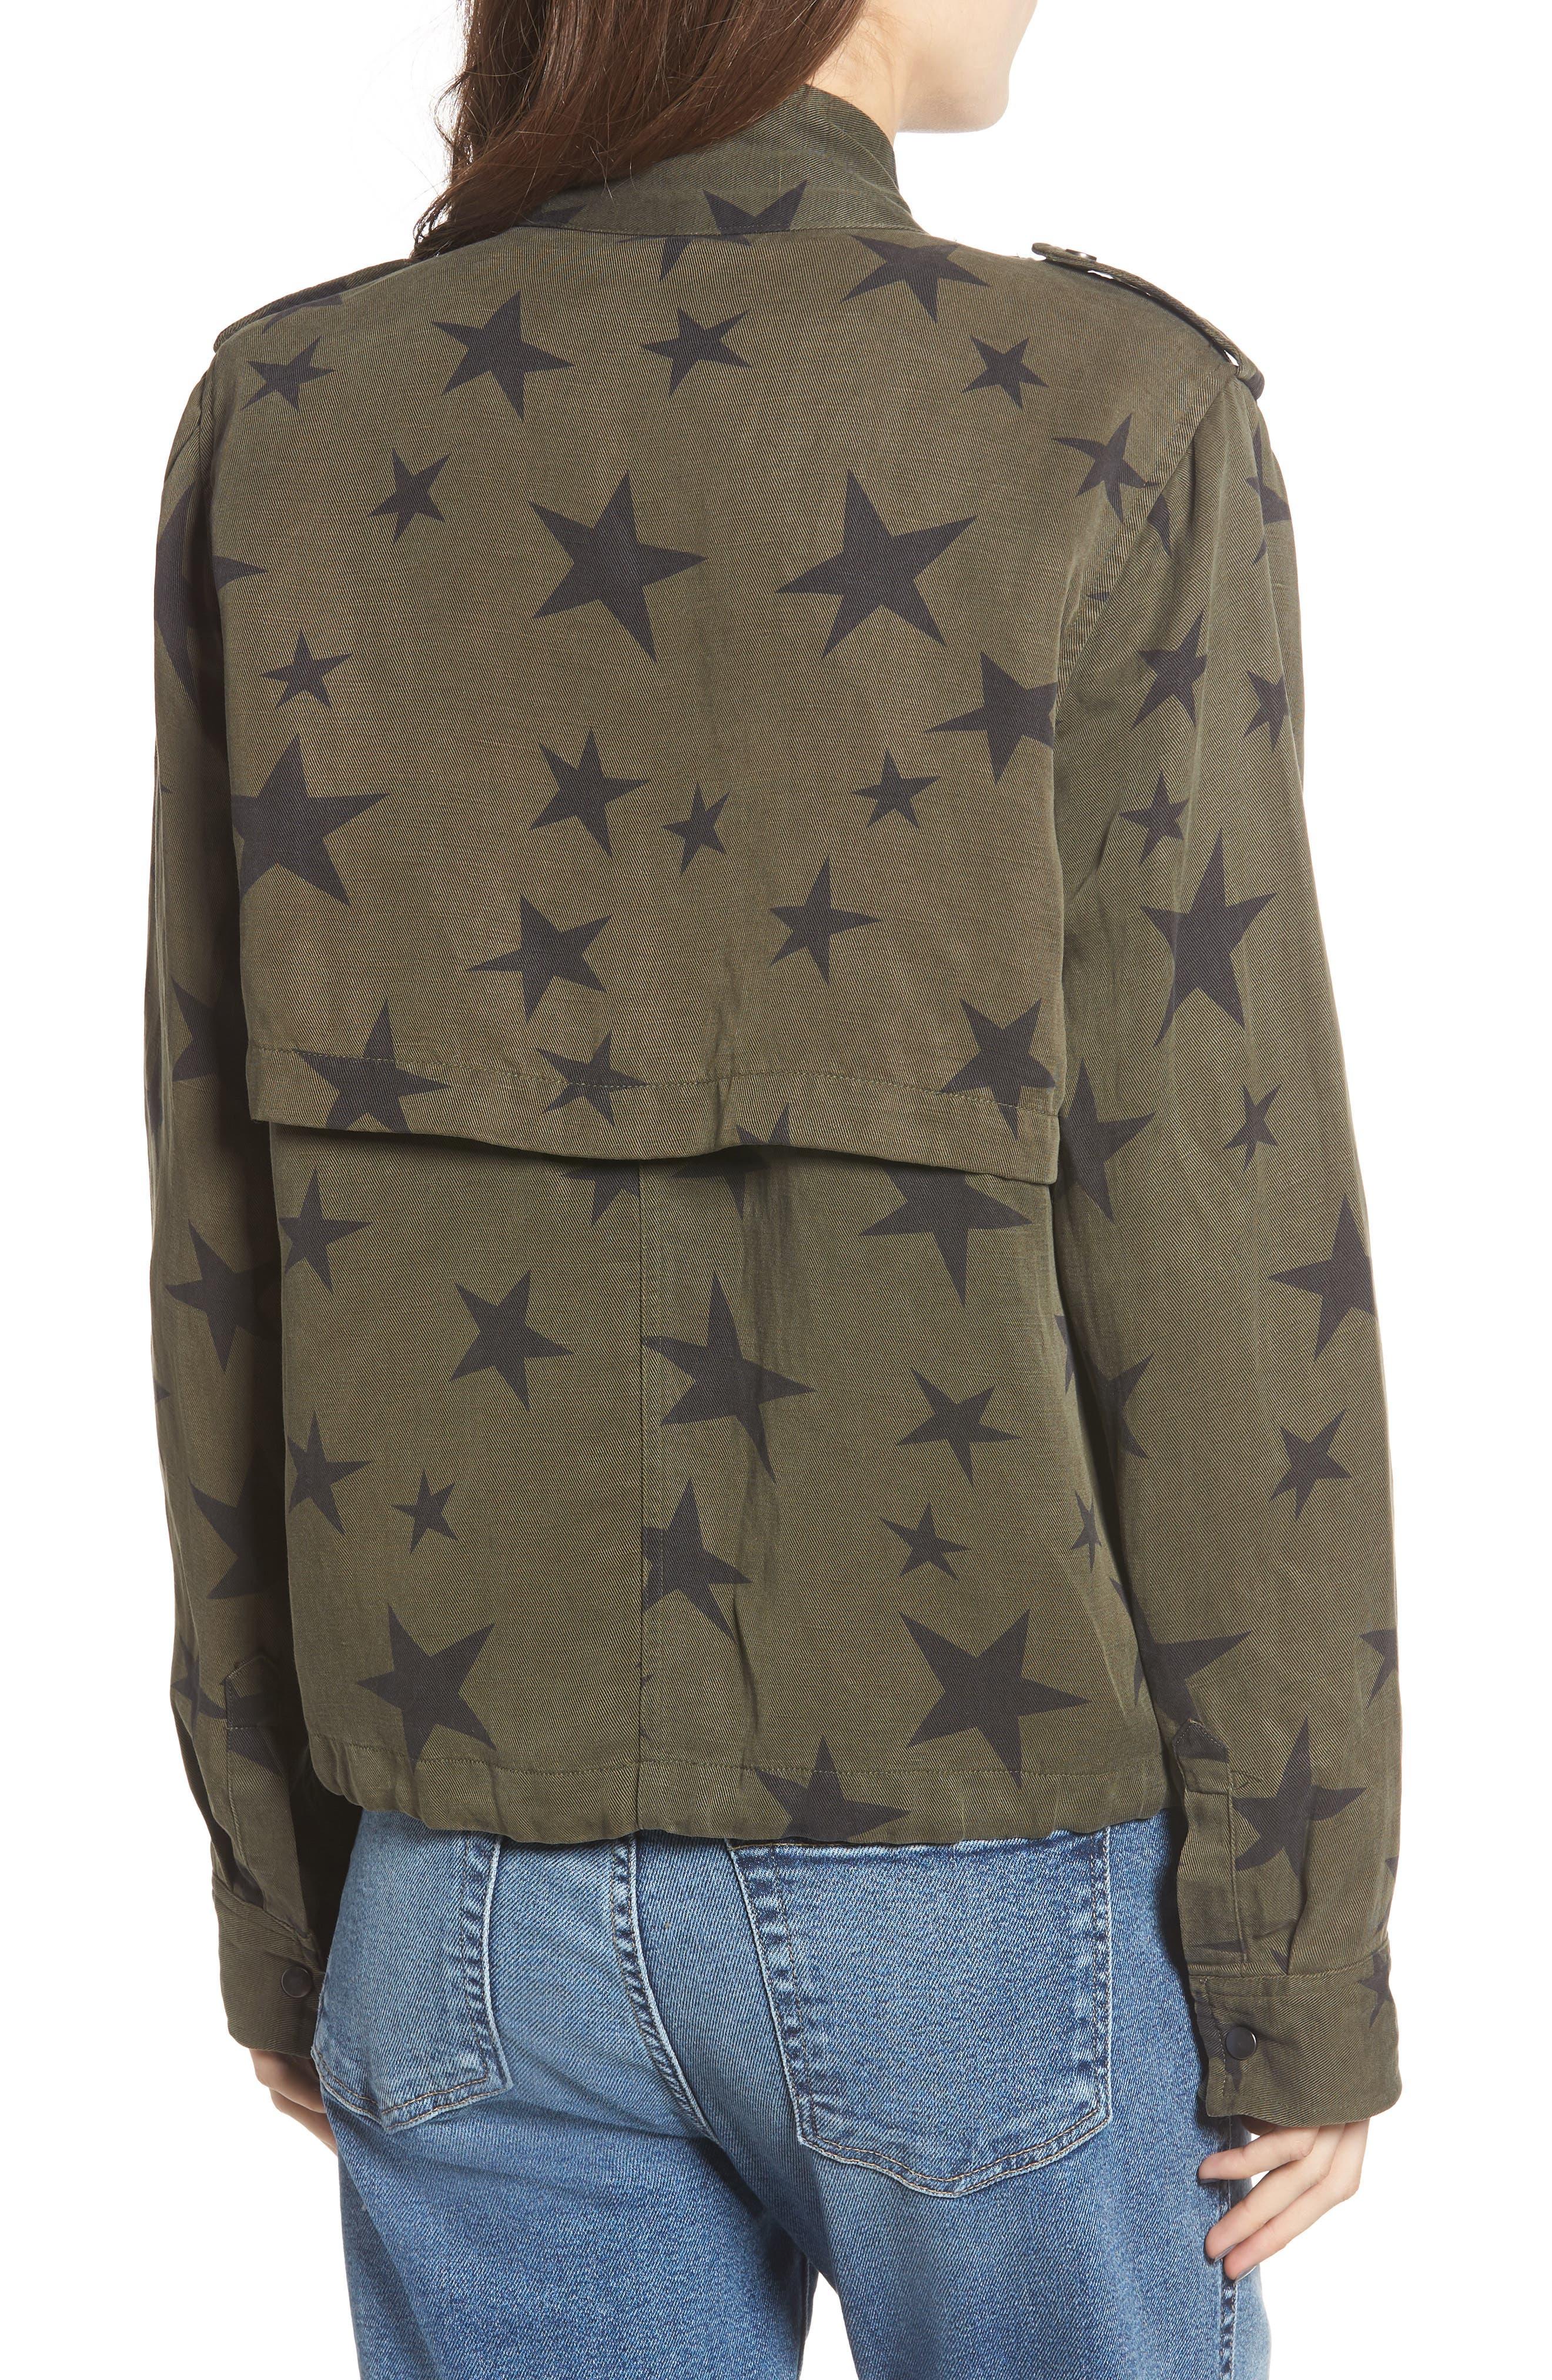 Collins Star Jacket,                             Alternate thumbnail 3, color,                             SAGE WITH BLACK STARS